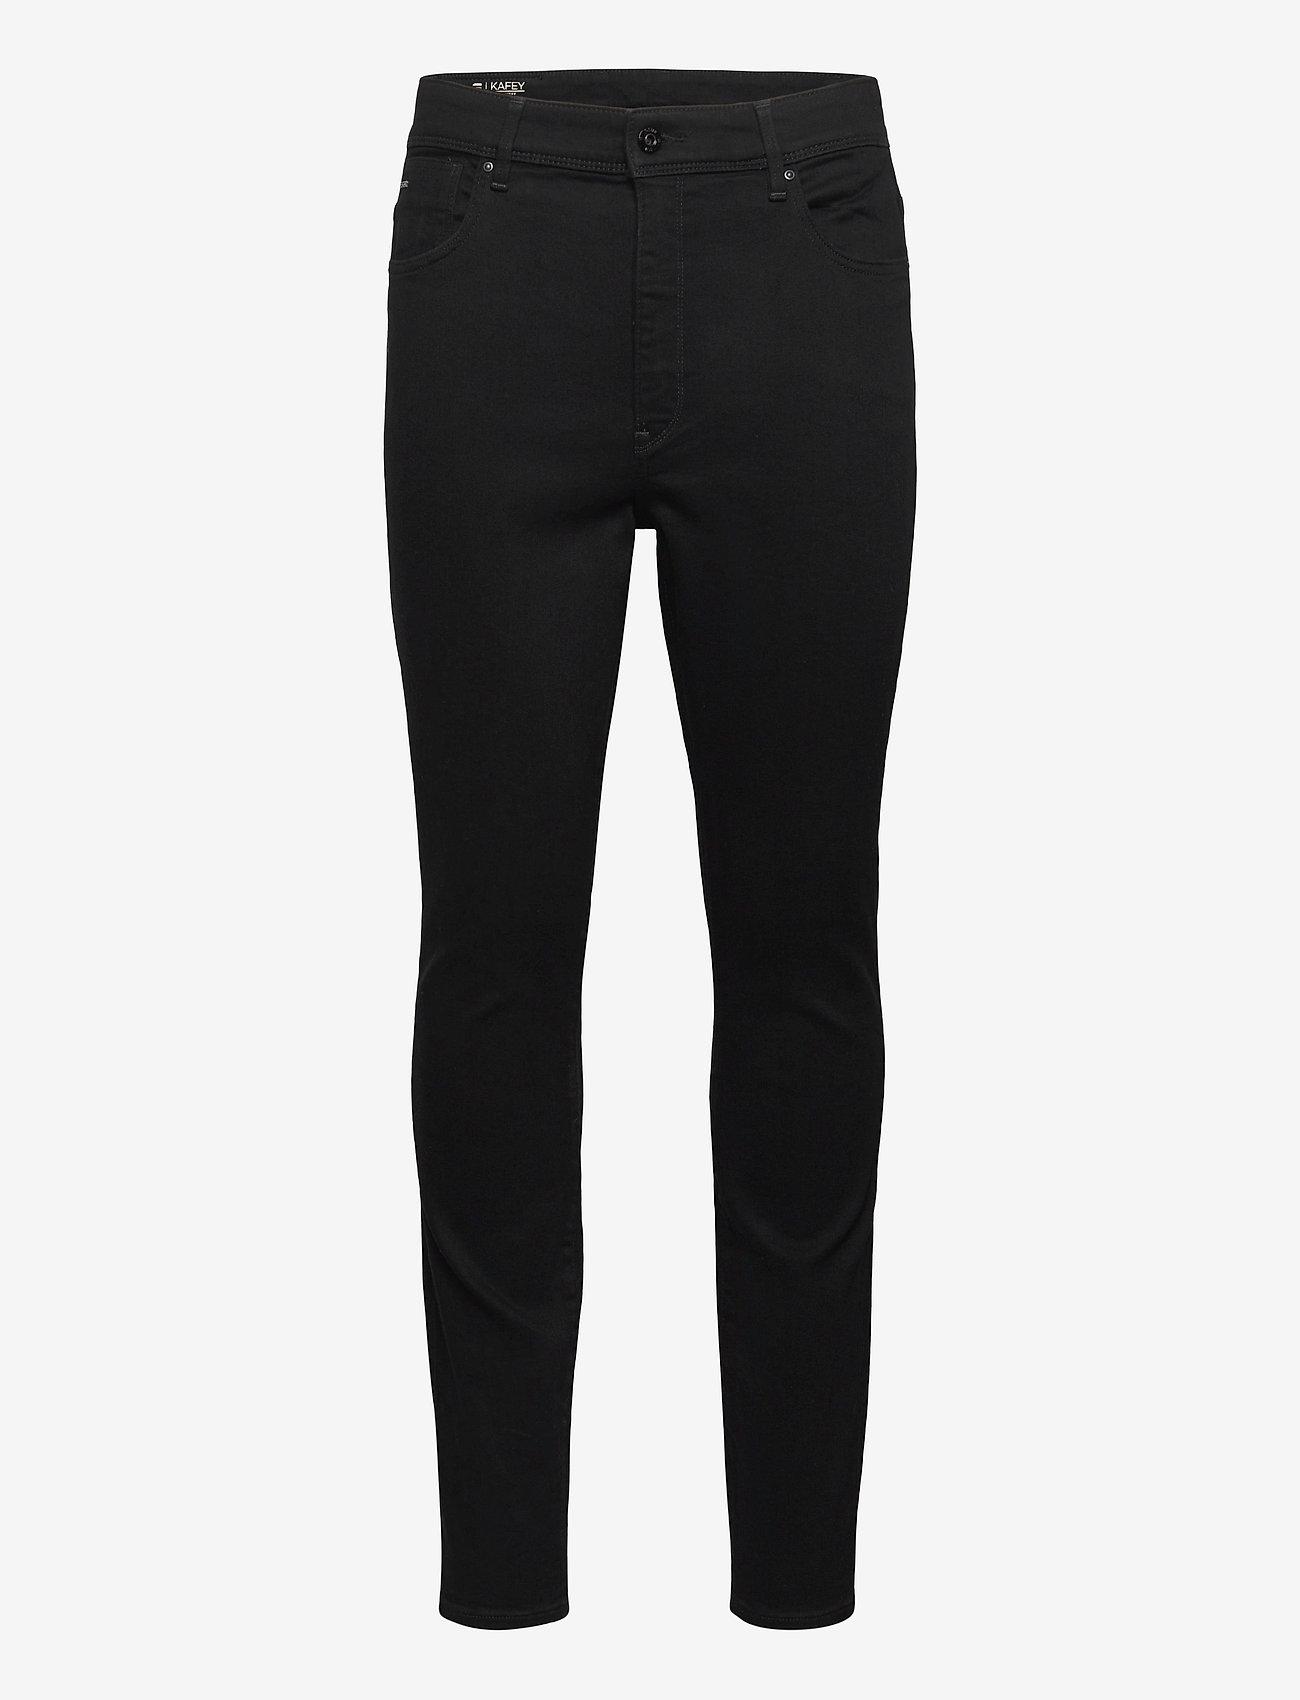 G-star RAW - Kafey Ultra High Skinny Wmn - skinny jeans - pitch black - 0